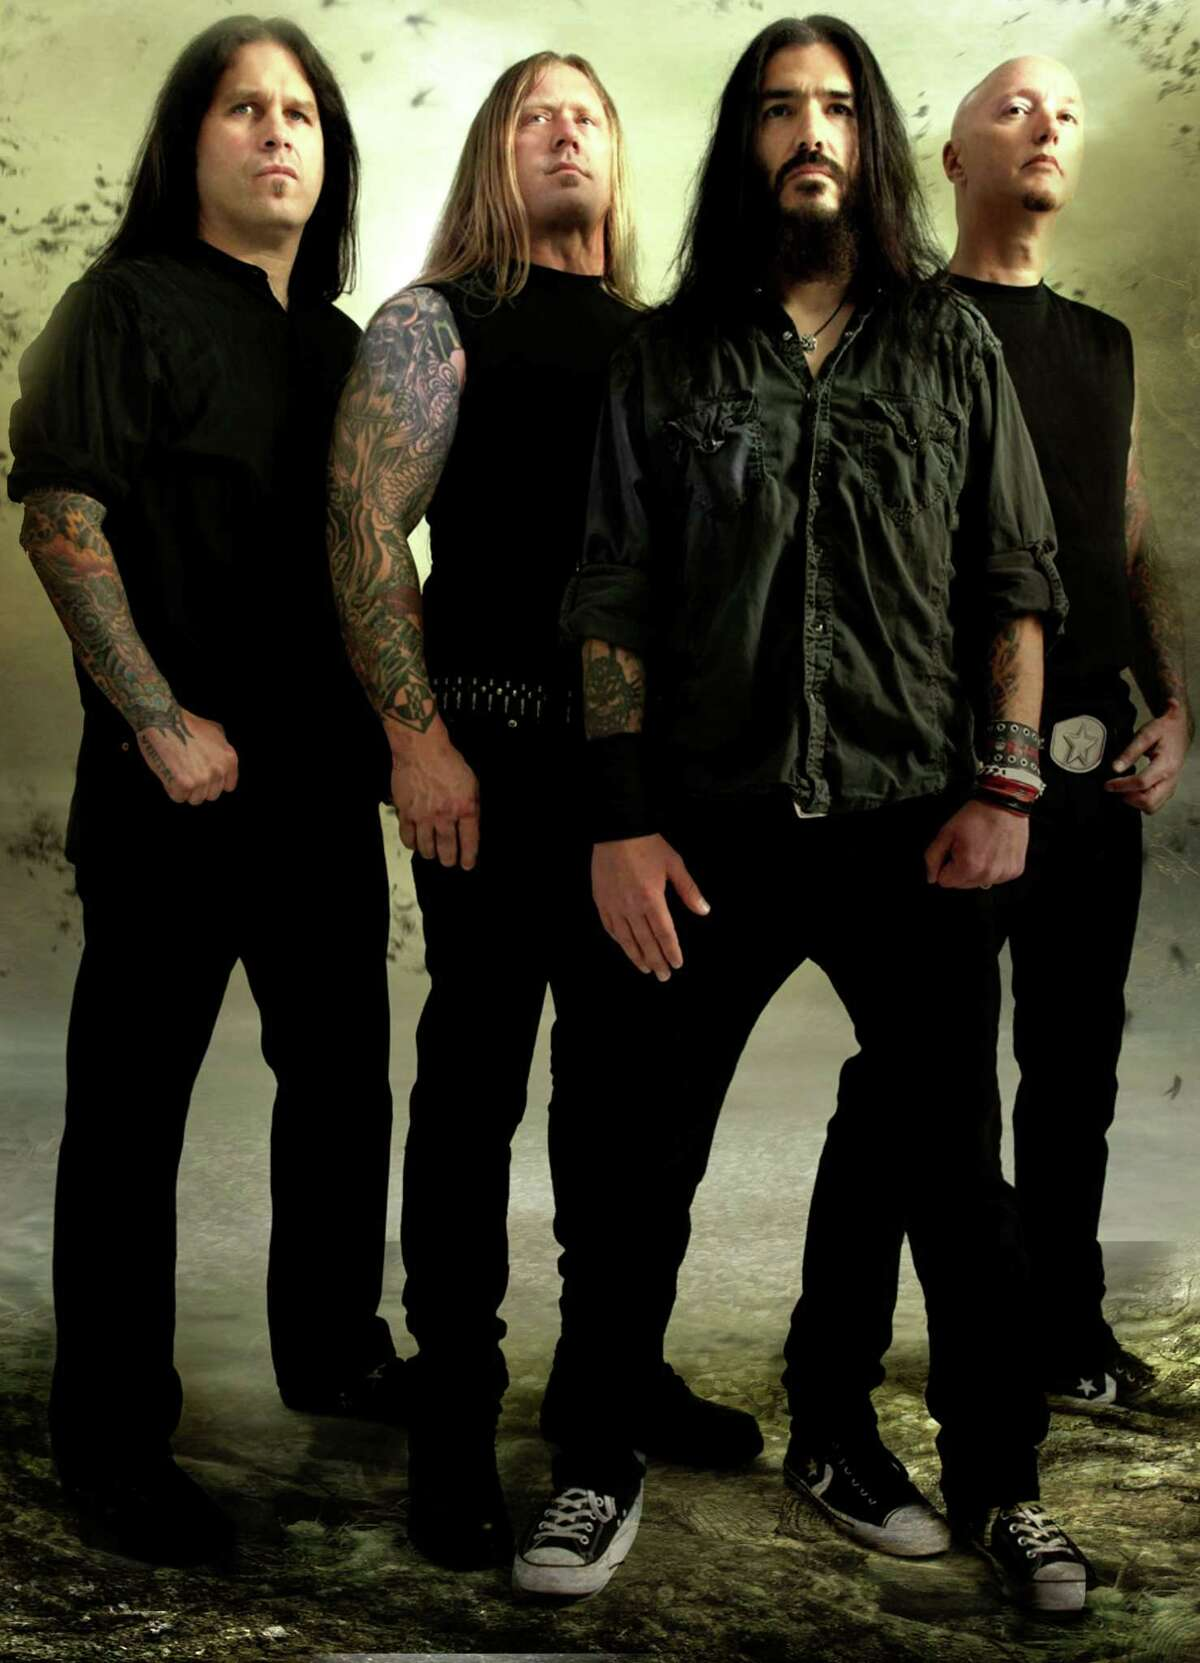 Alt-metal band Machine Head